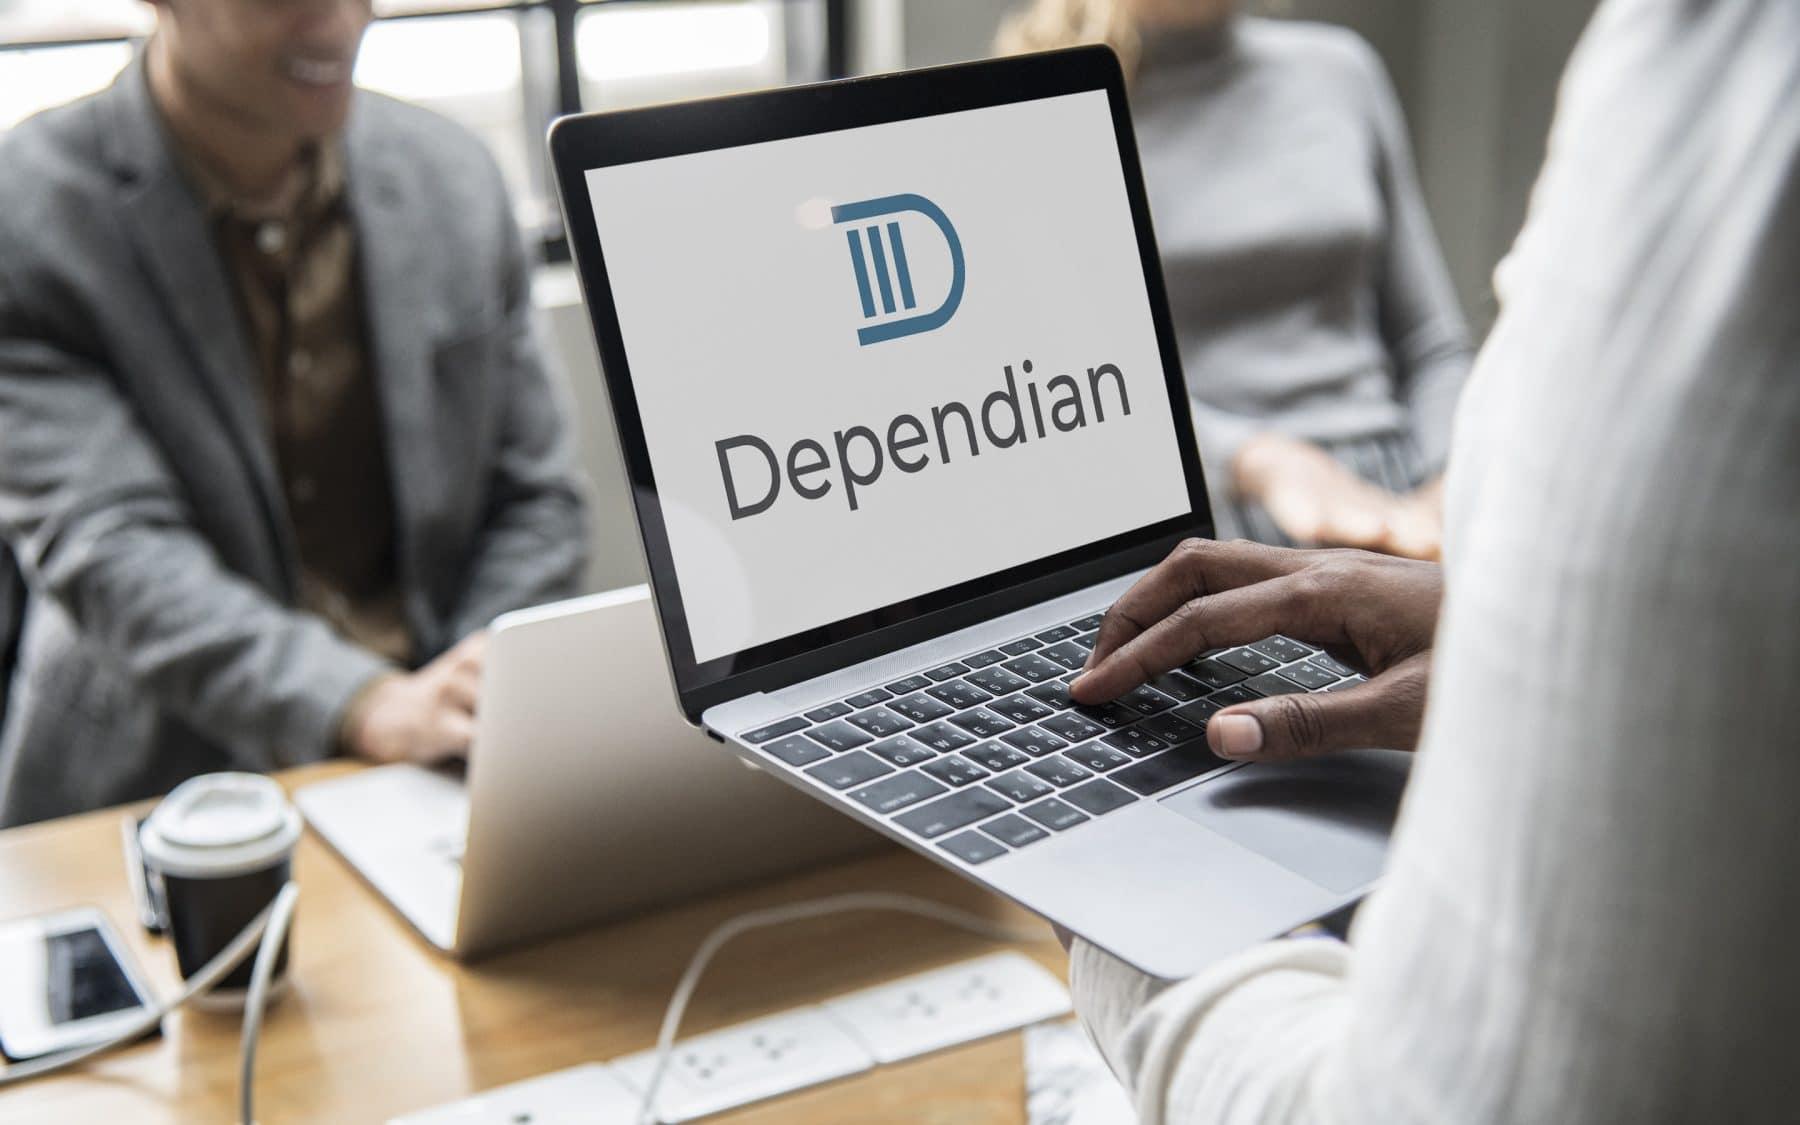 Dependian